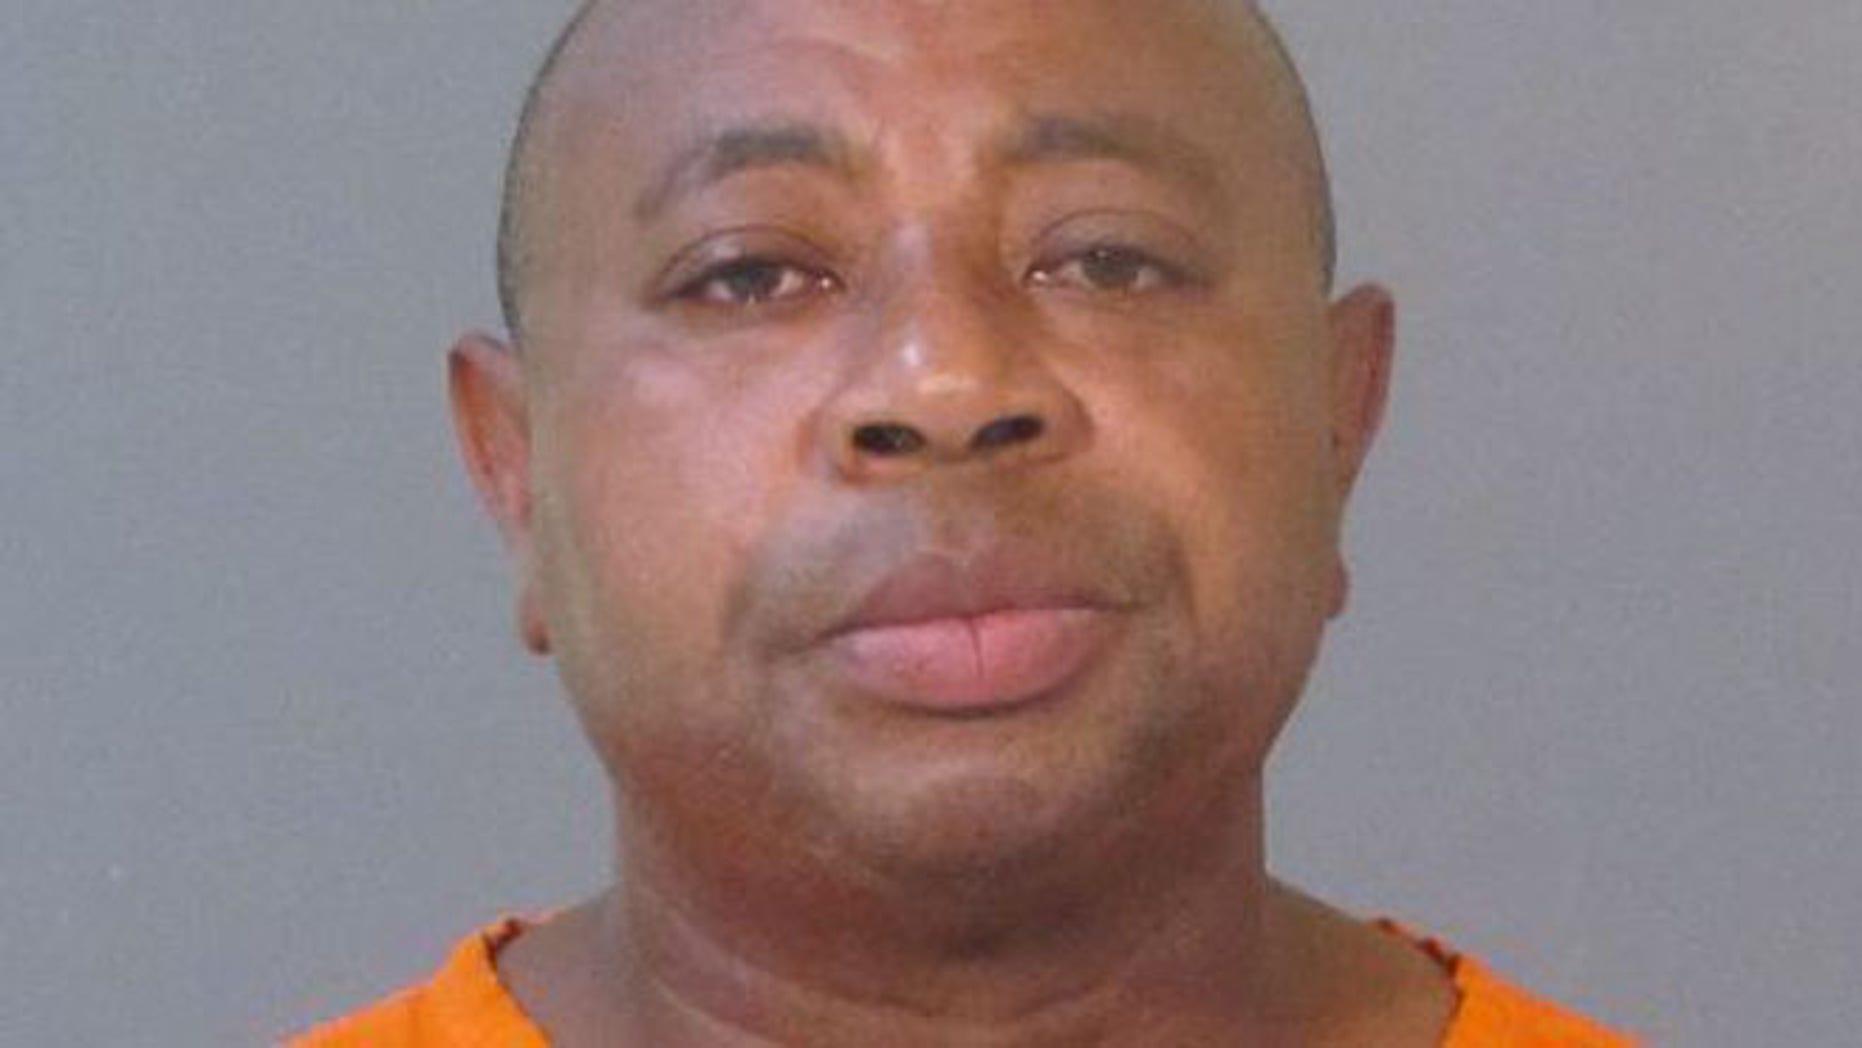 Woodrow Karey, Jr. is being held on $1 million bond in the shooting death of a preacher.